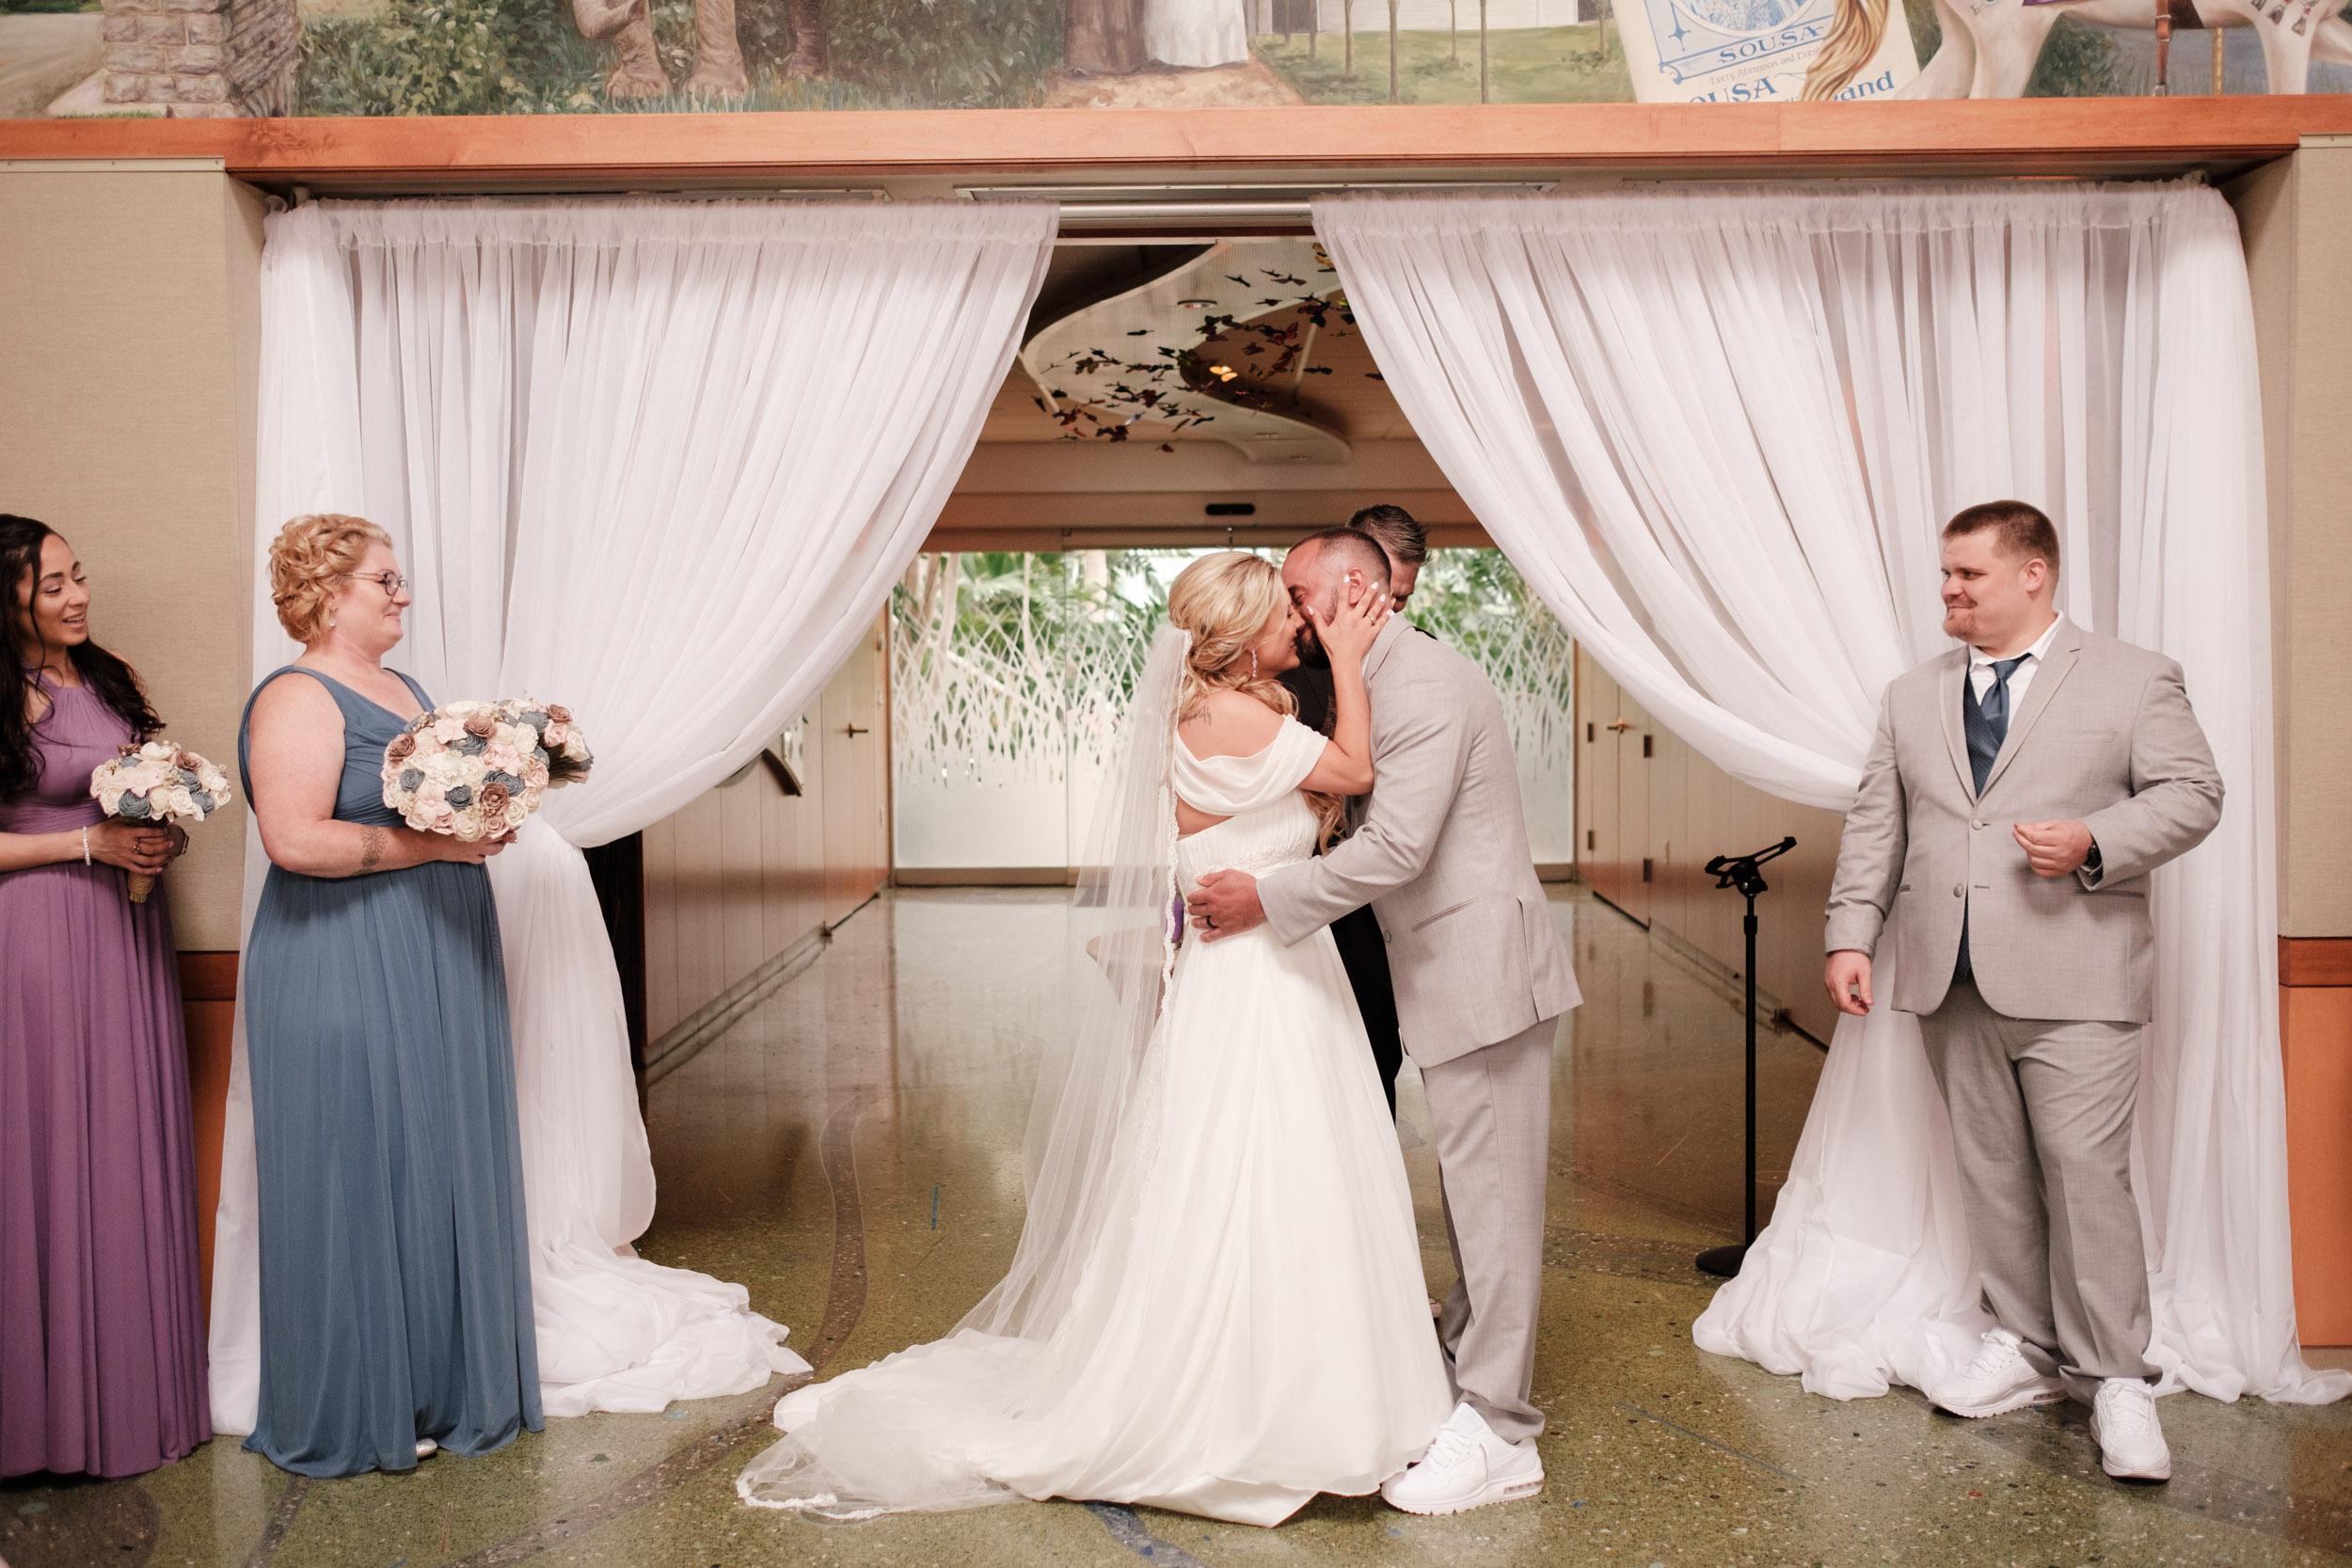 19-06-01 Megan Josh - Nicholas Conservatory Wedding-22.jpg